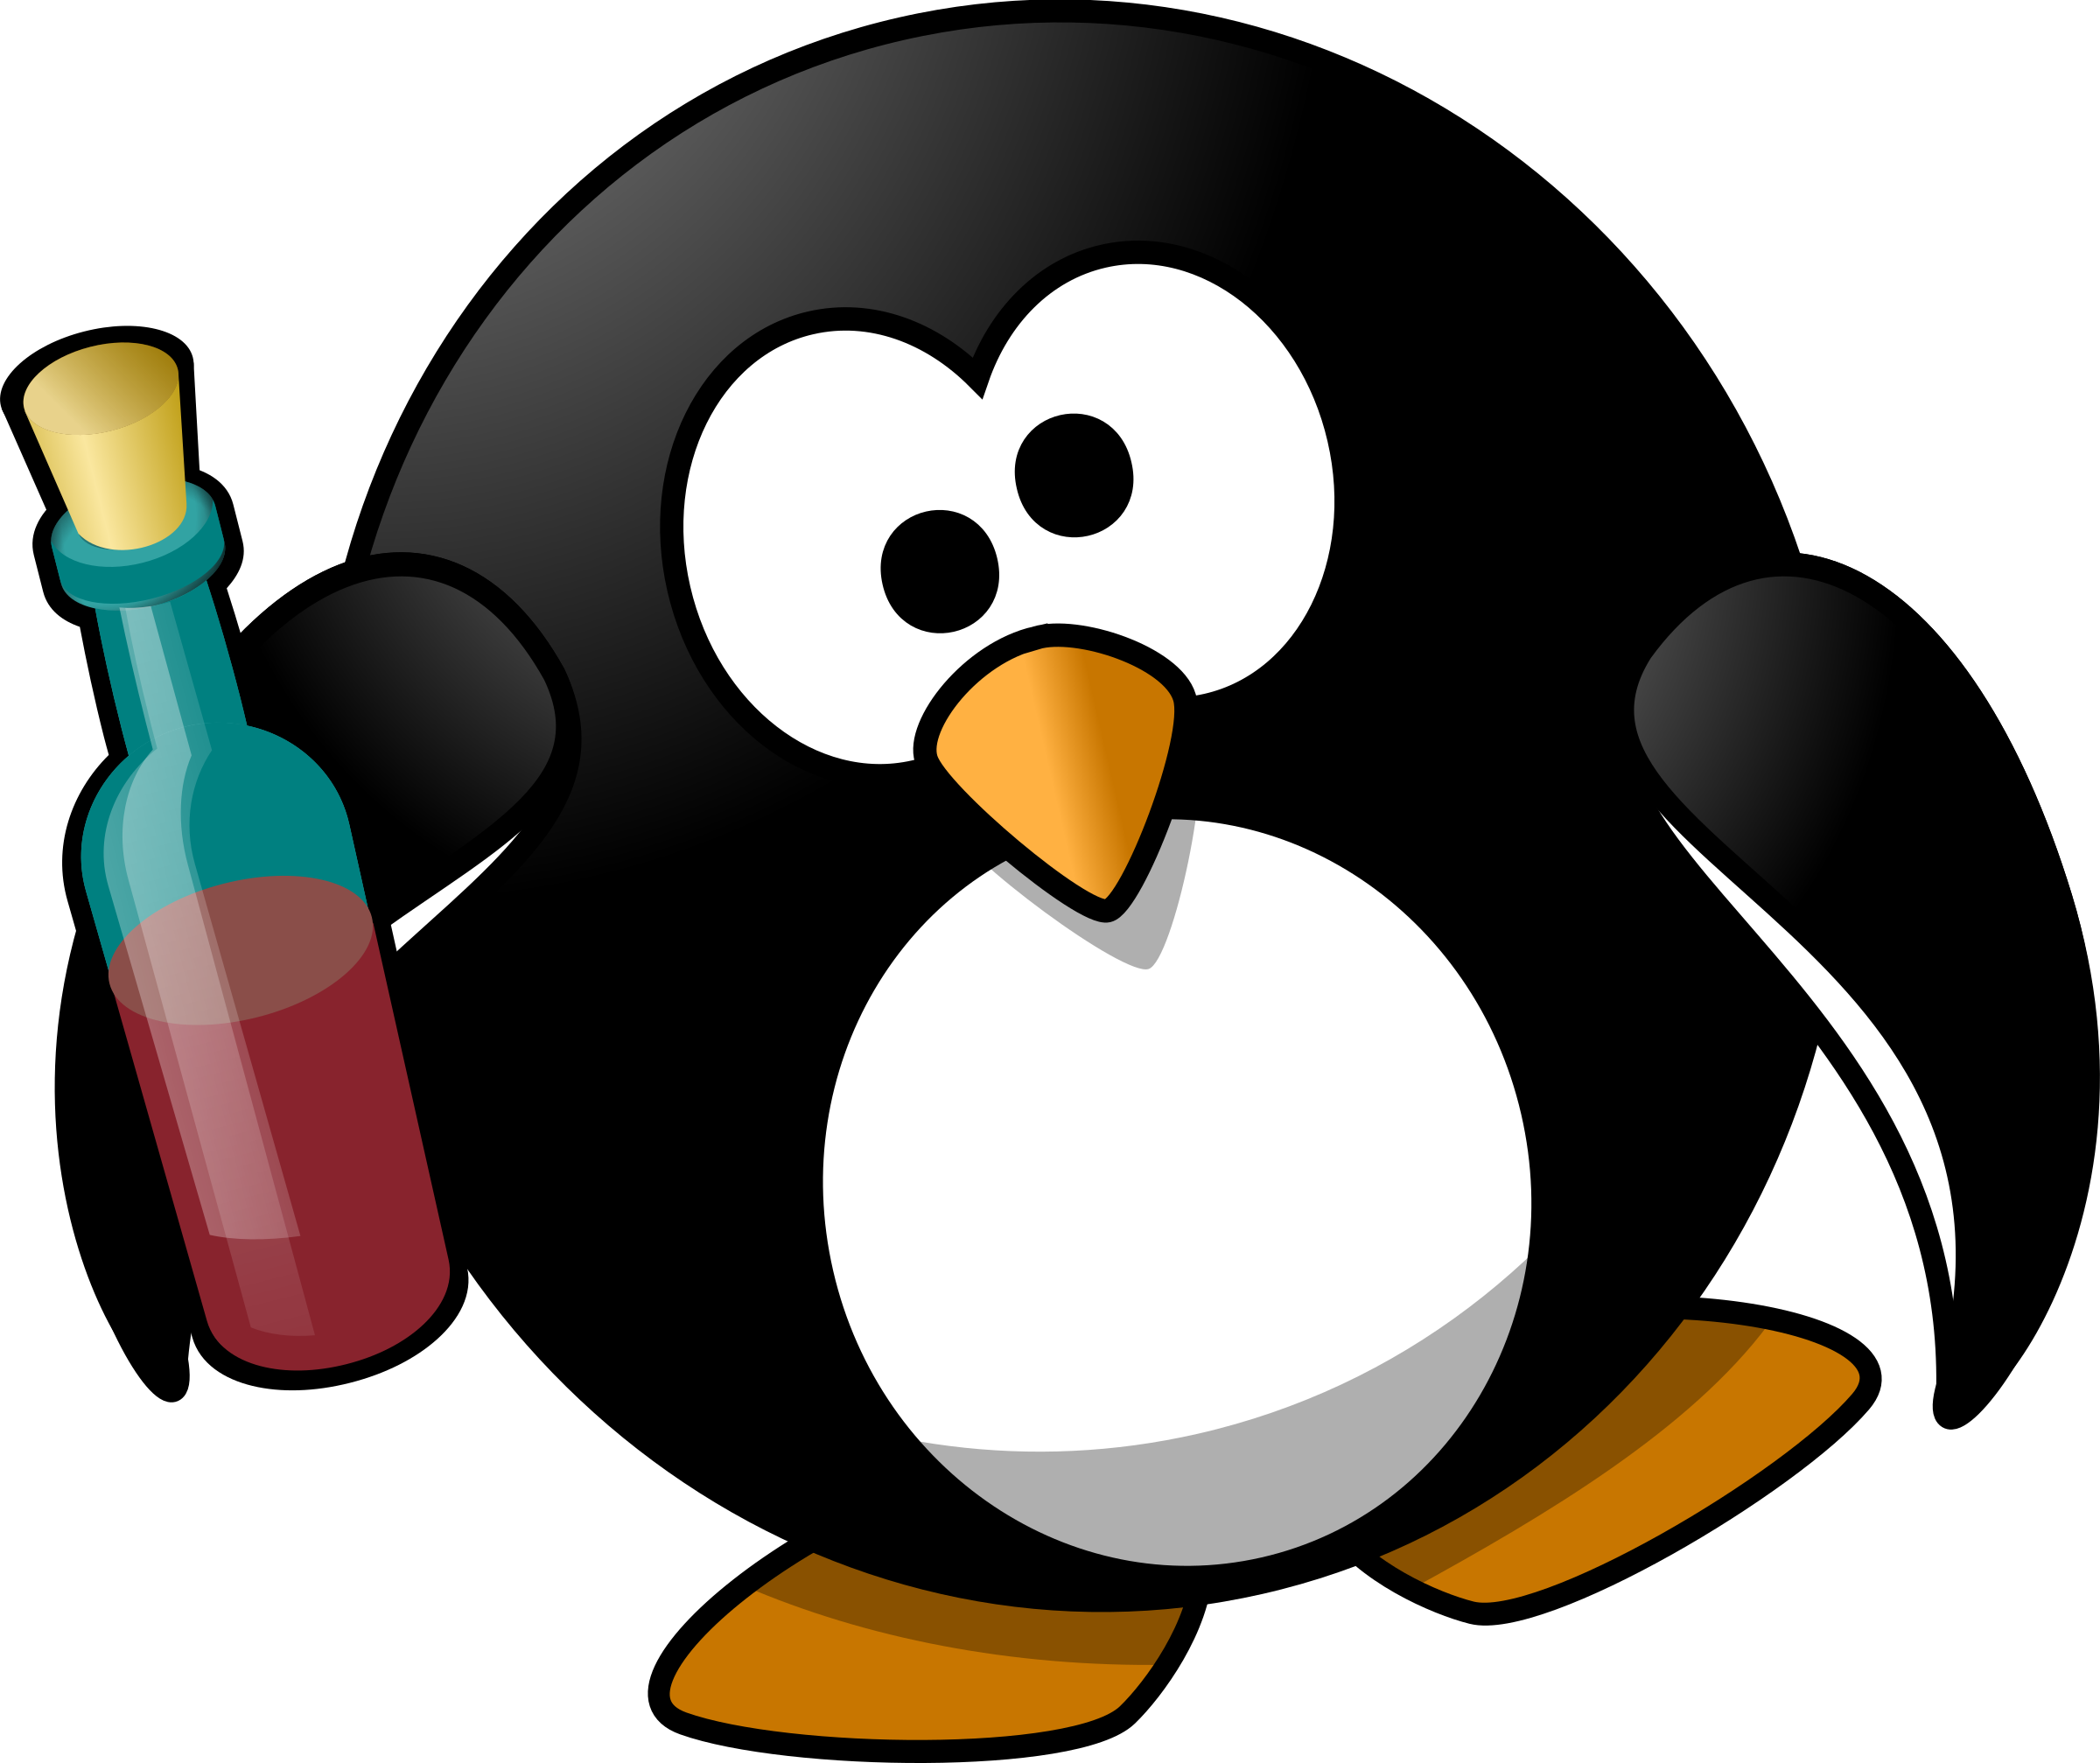 Drunk penguin big image. Clipart penquin pengui